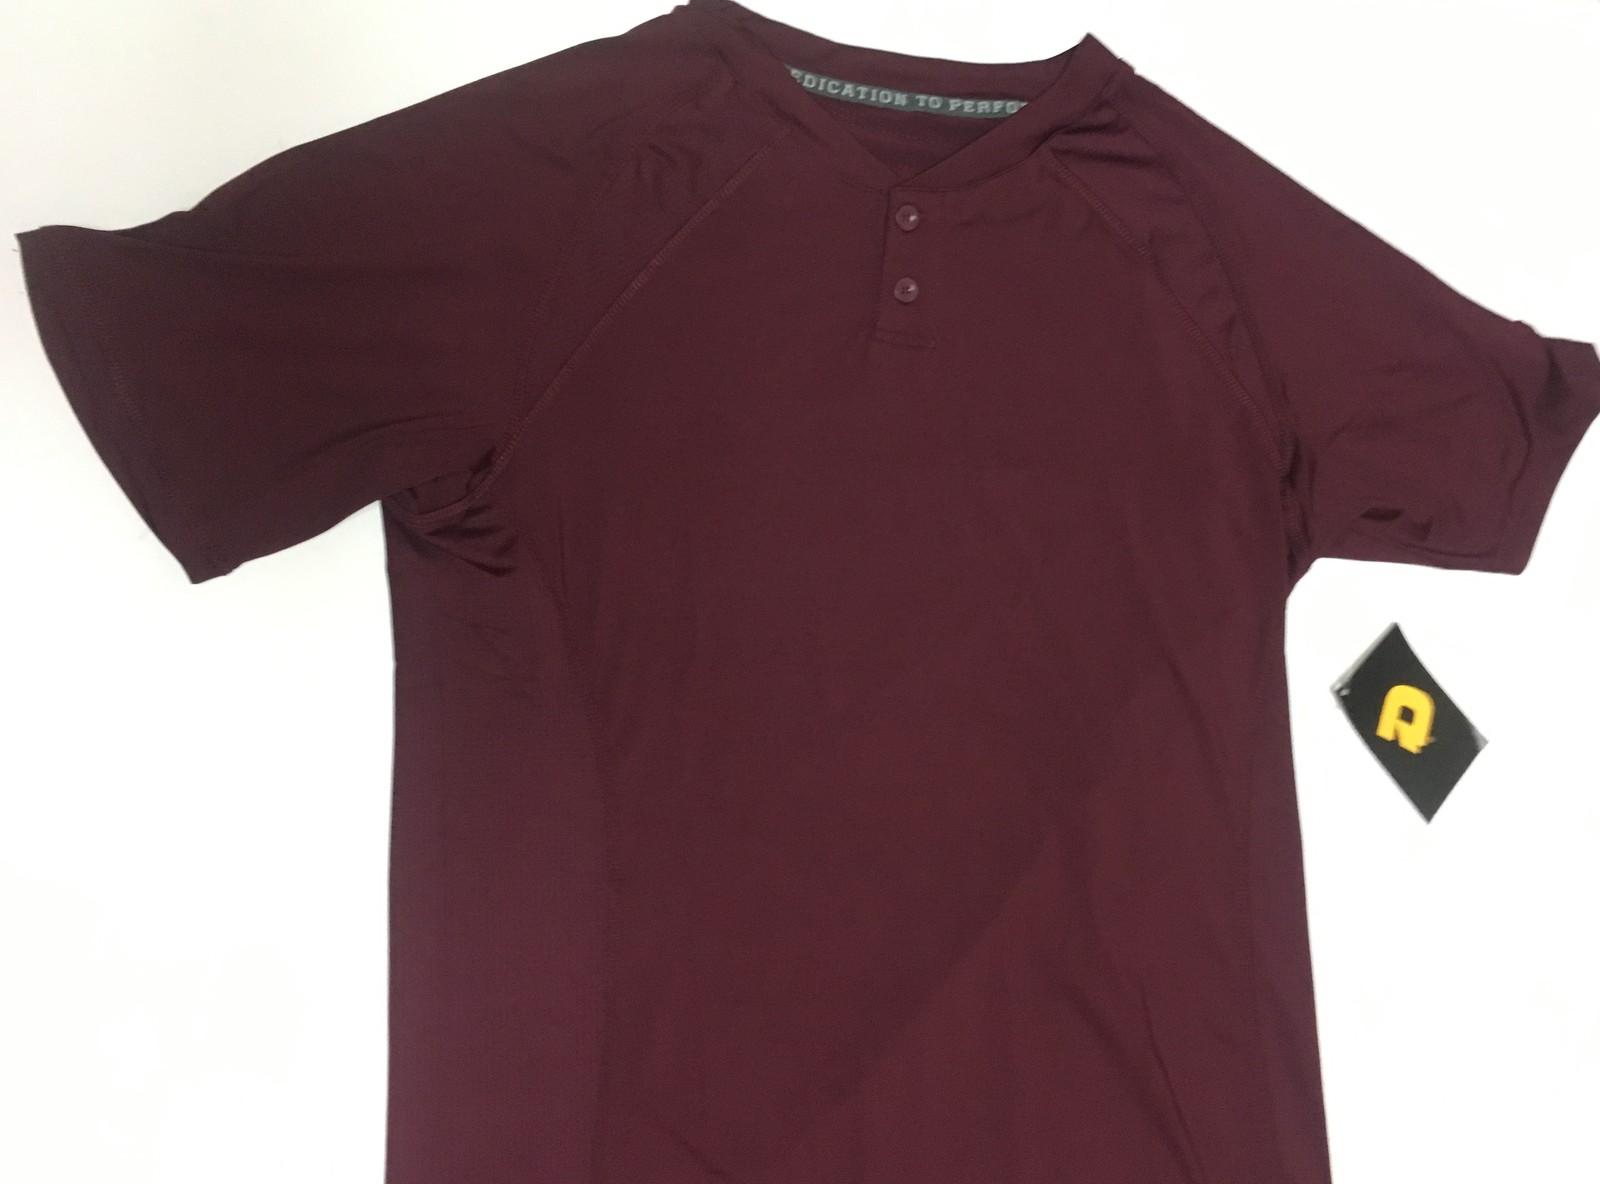 DeMarini Sports Comotion Performance Shirt Men's Sz L Maroon